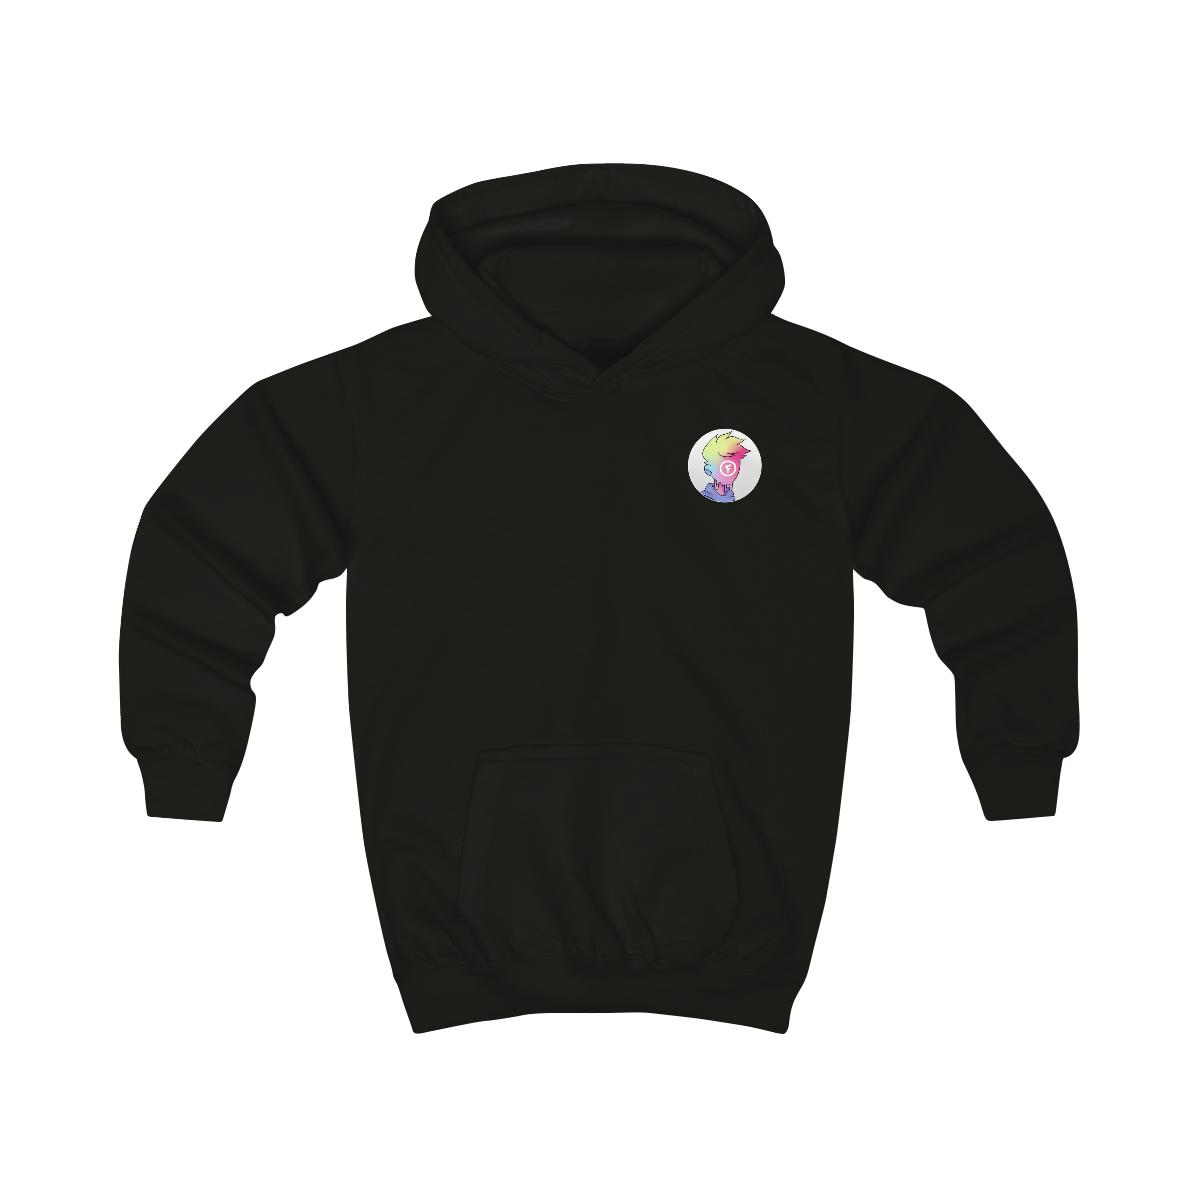 Kids - Fitz Logo Hoodie - Chest Print